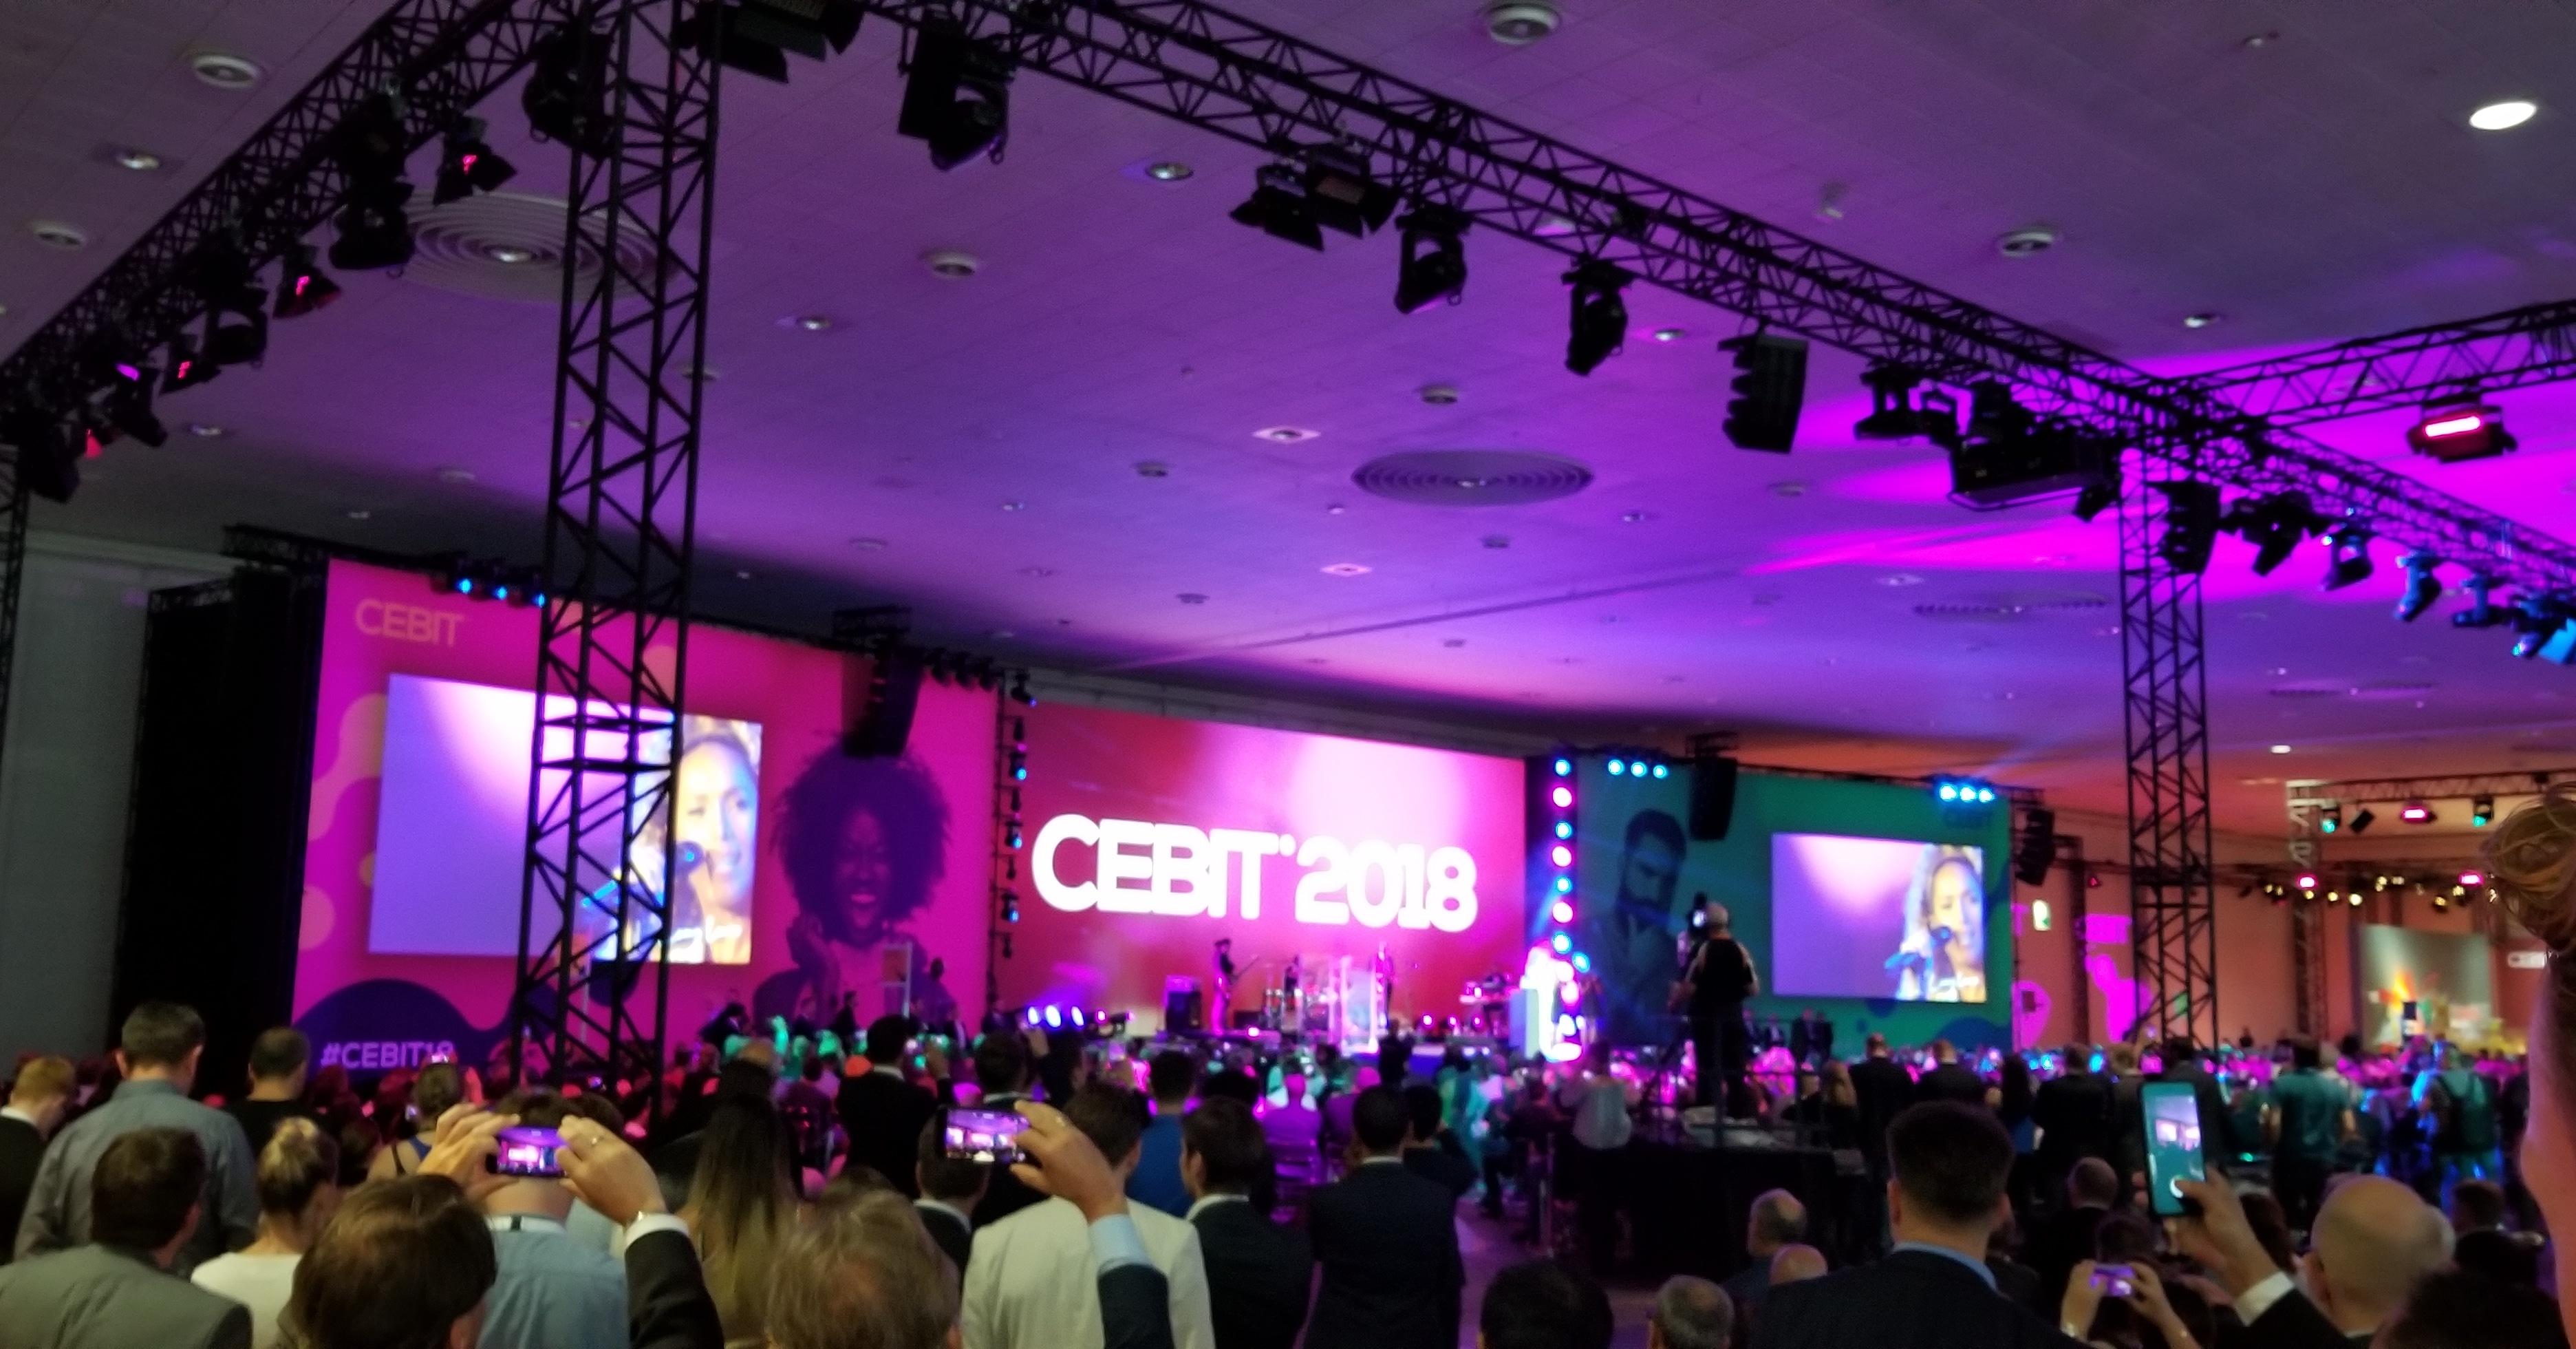 CEBIT welcome night